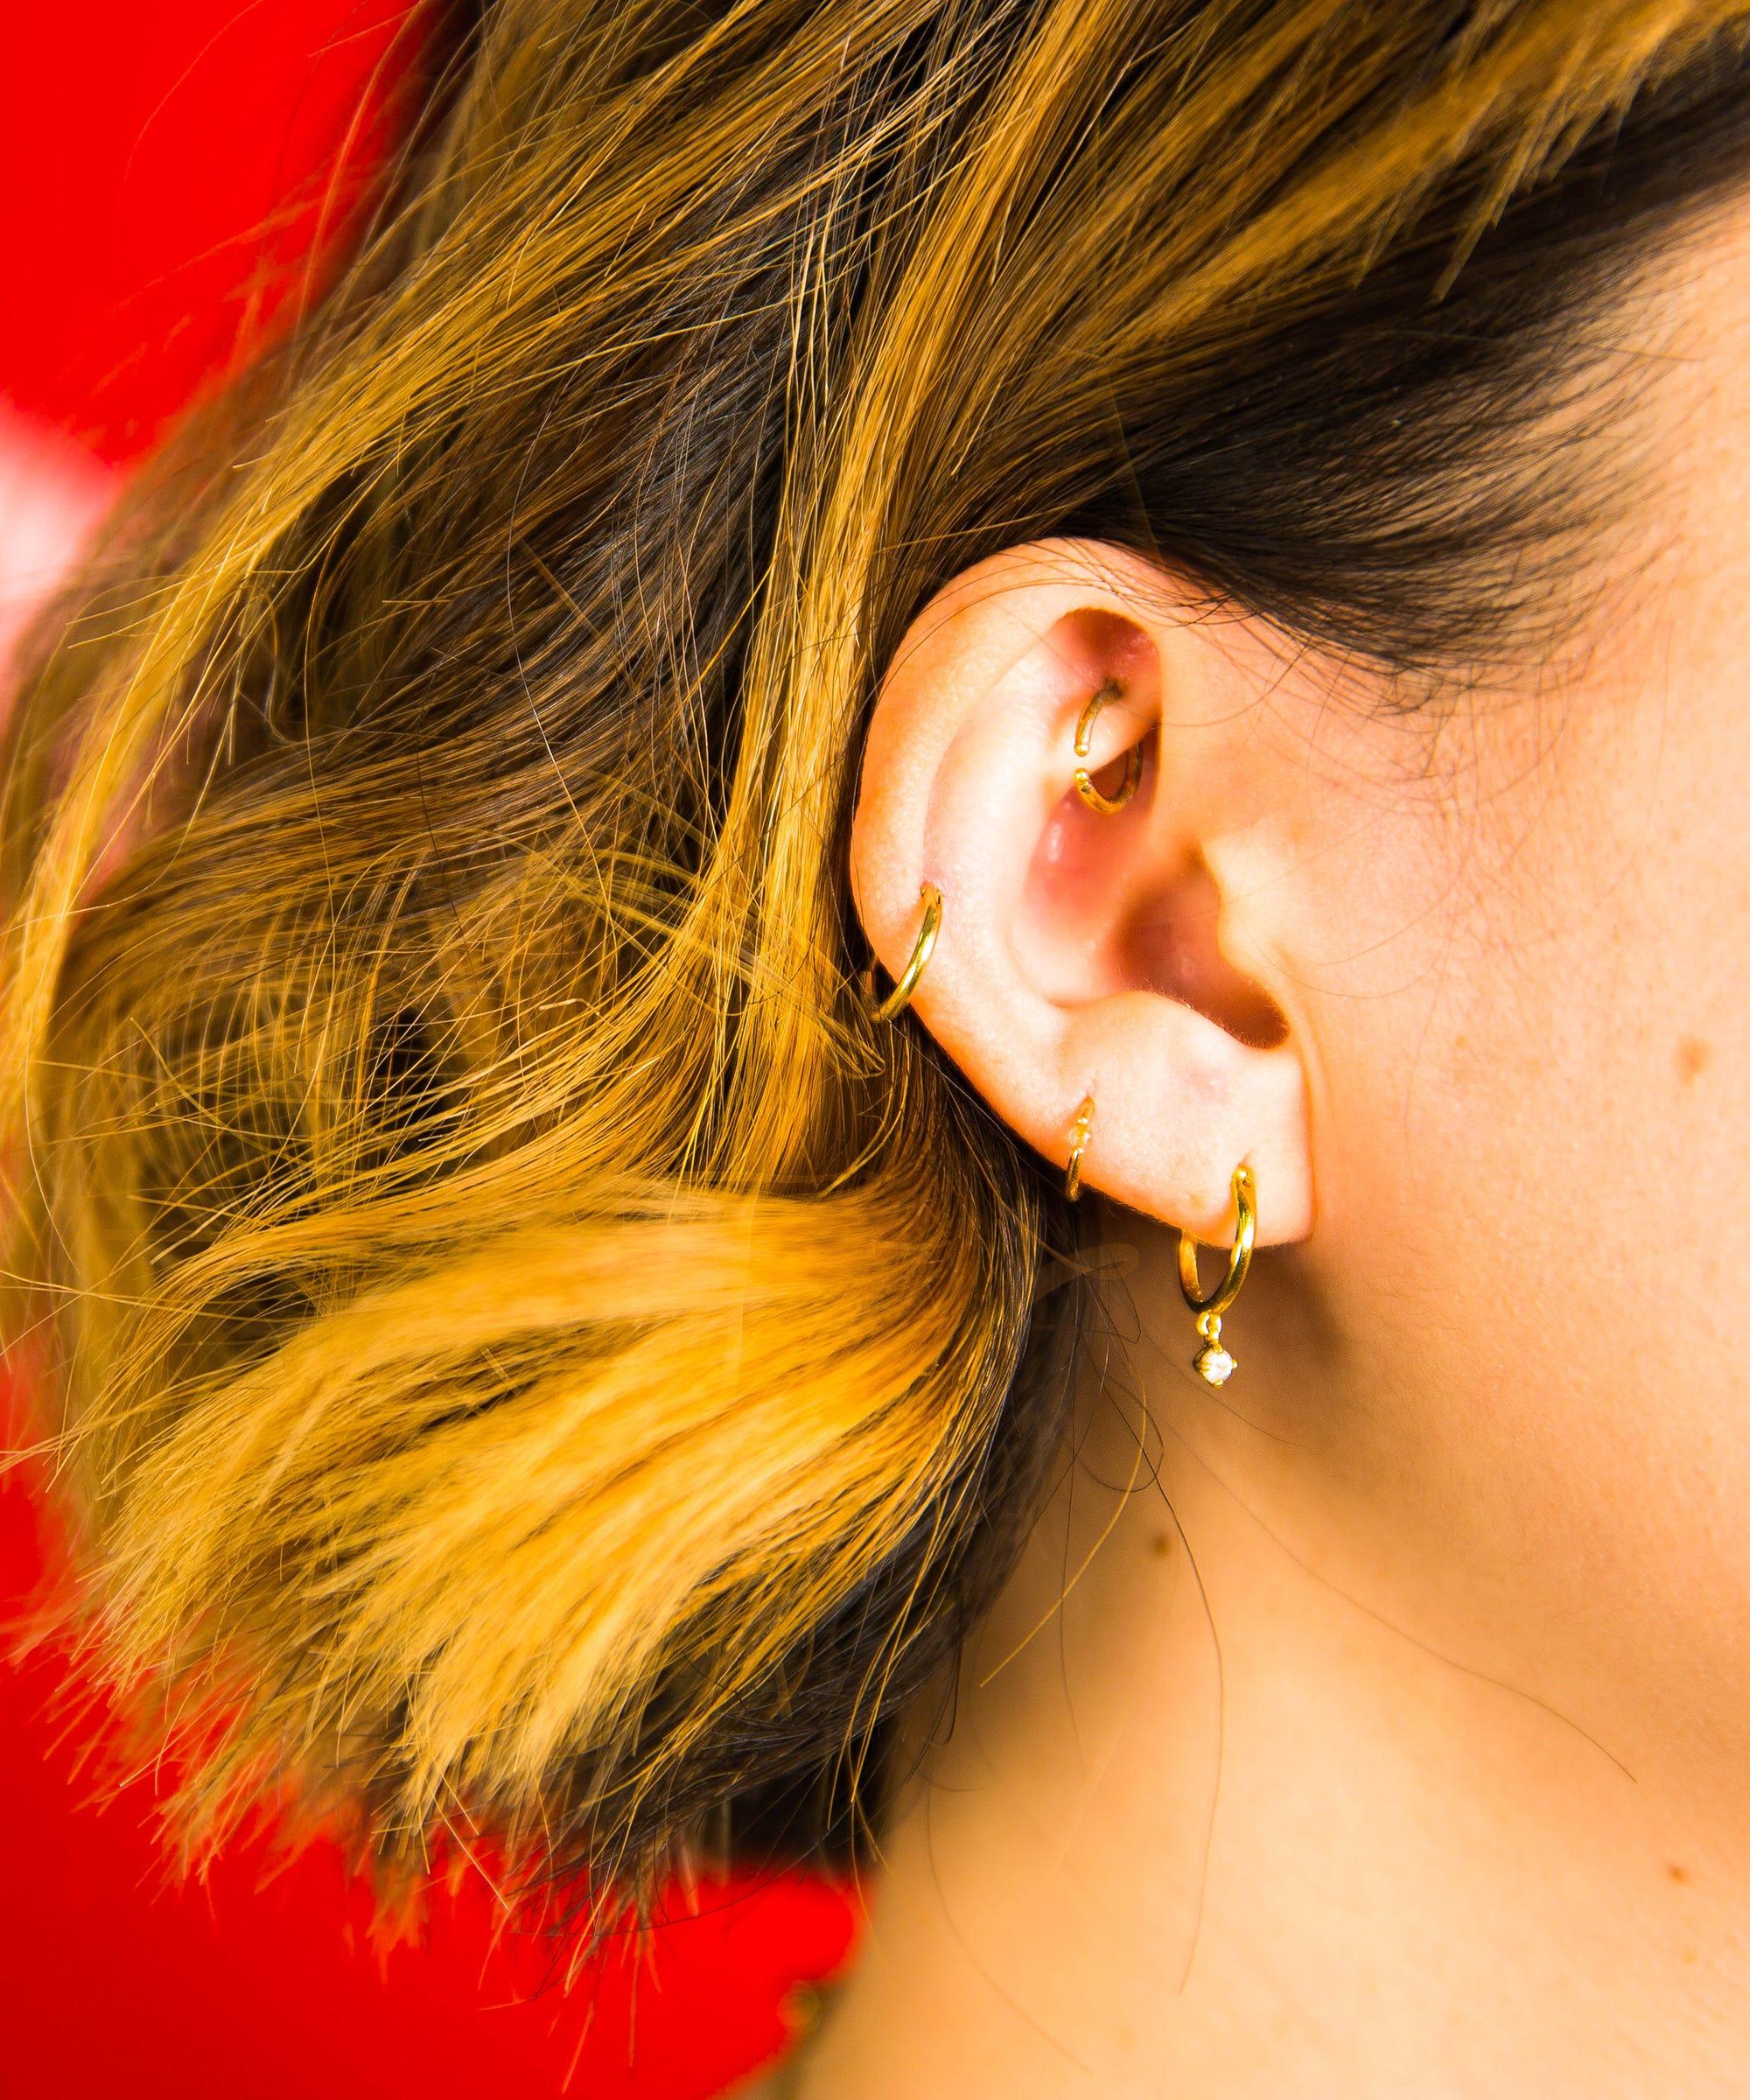 Can Daith Ear Piercings Prevent Migraines